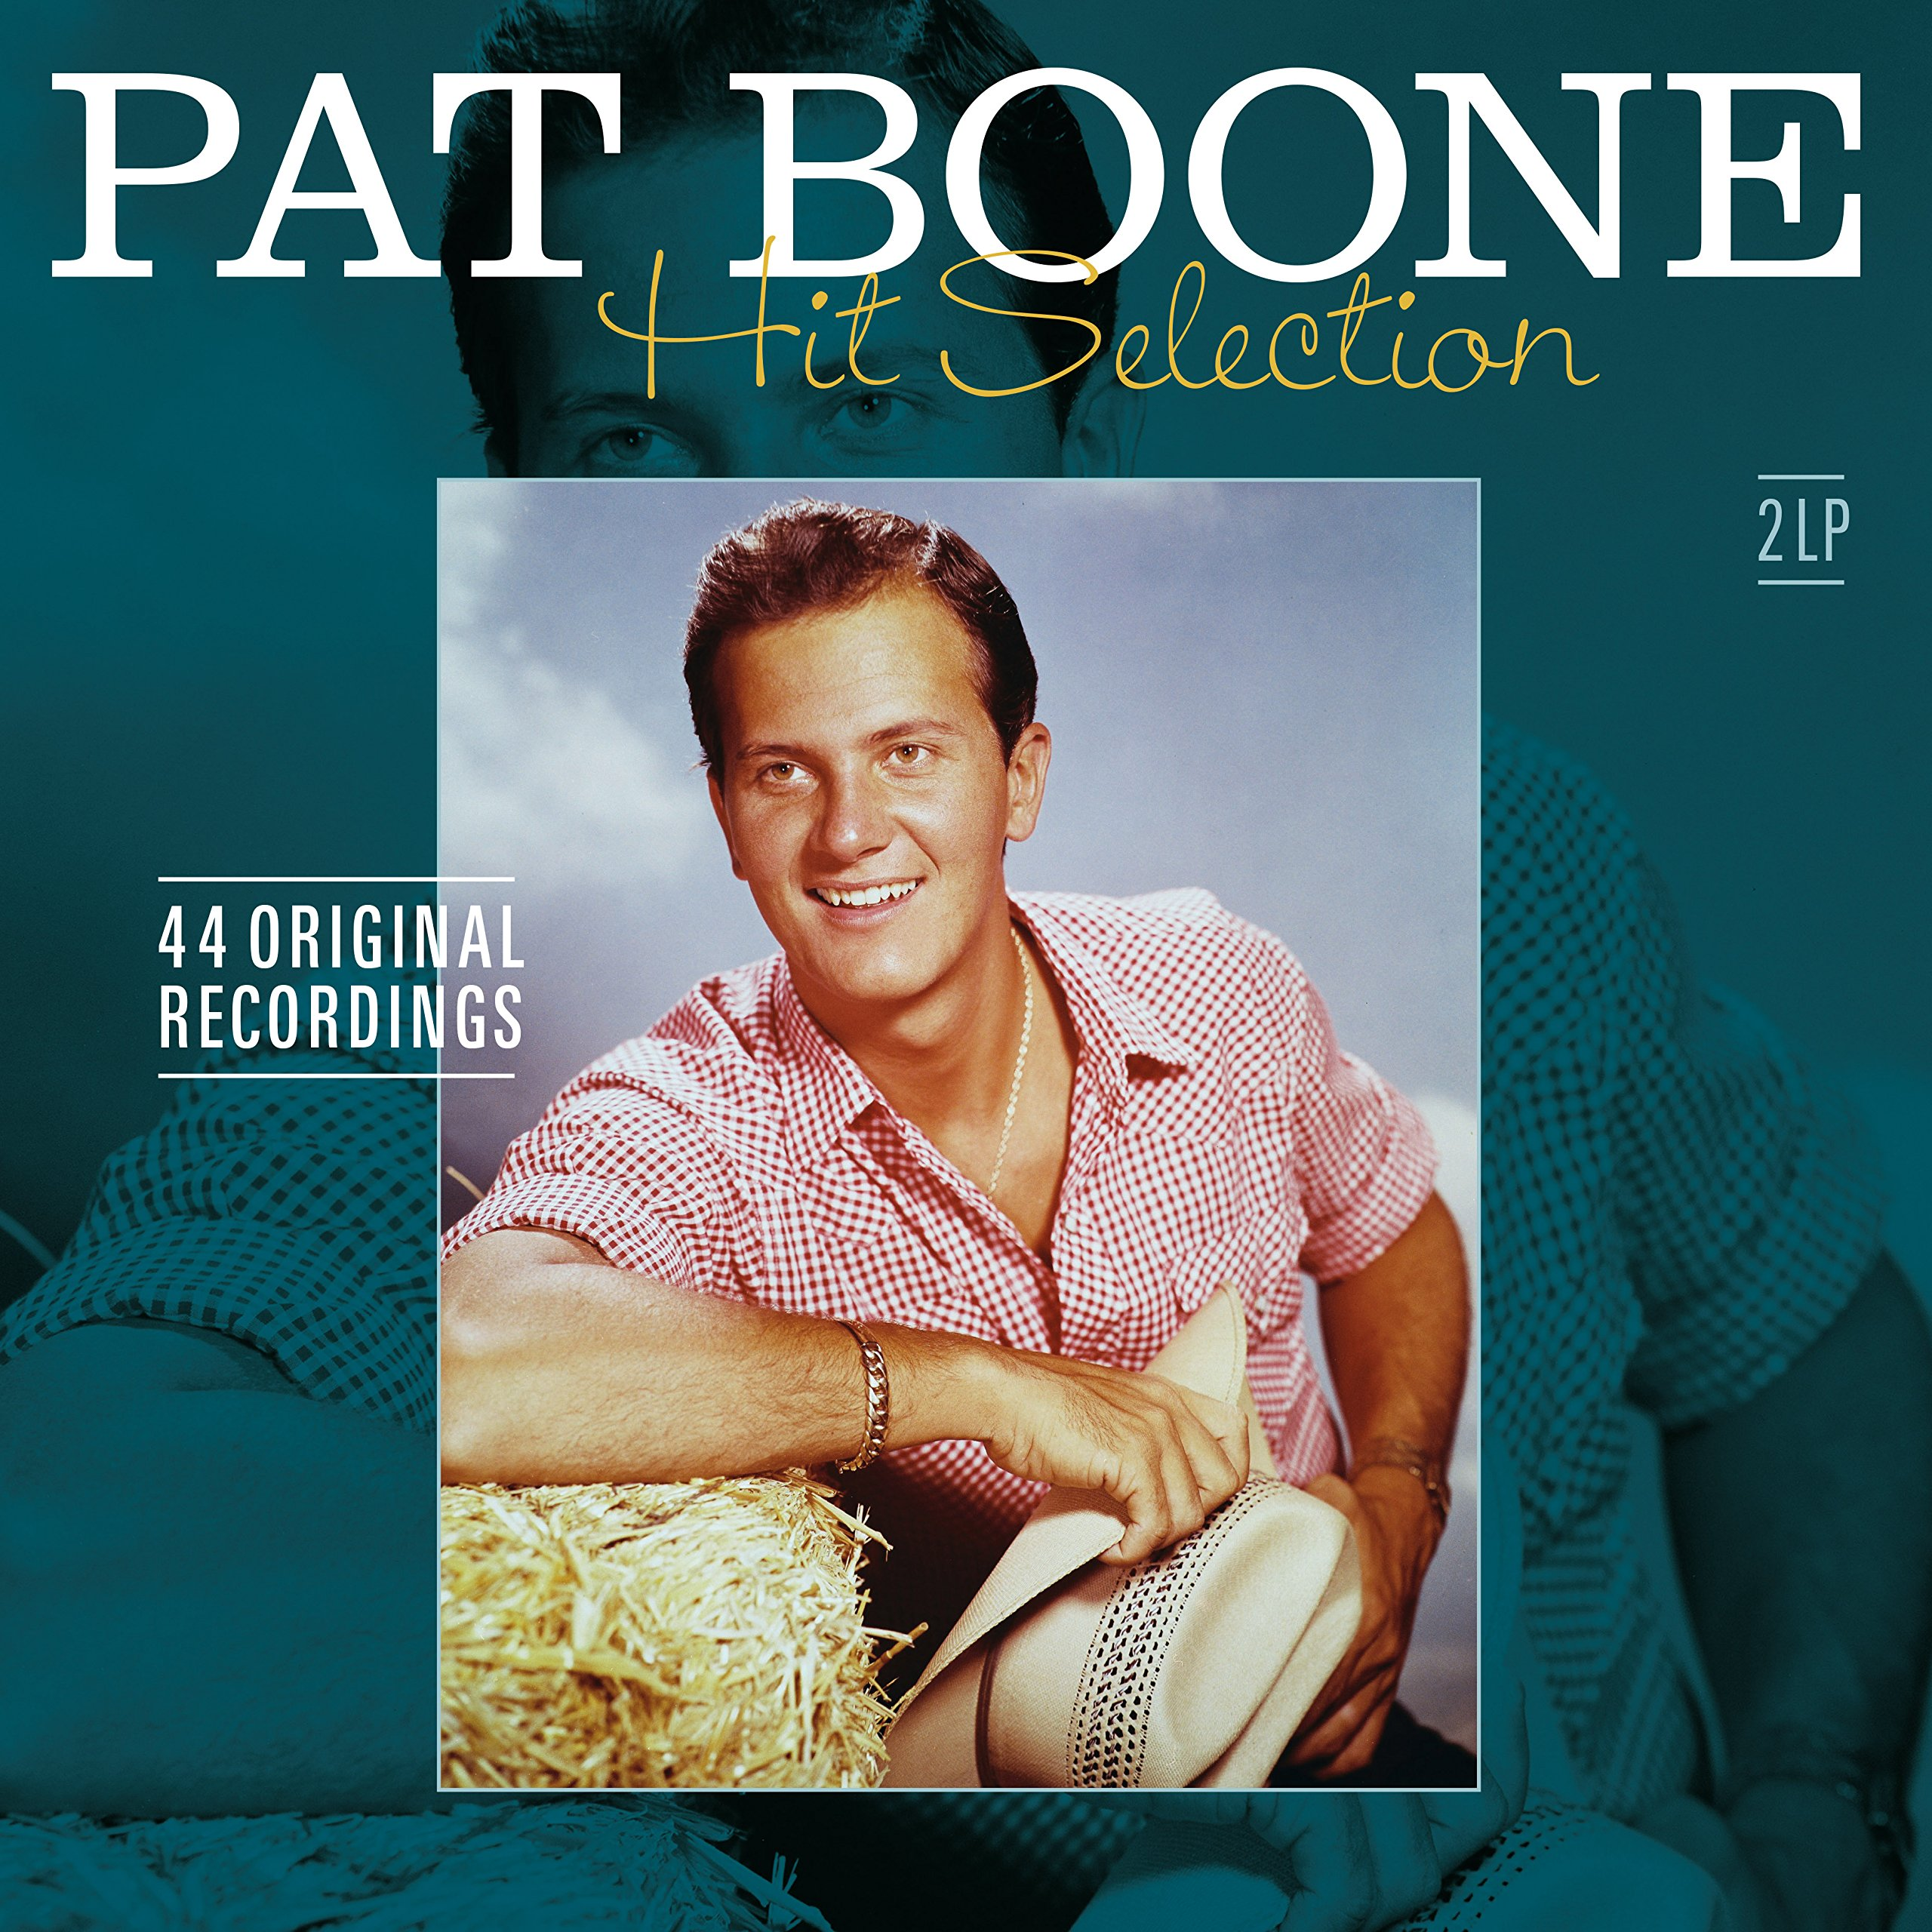 Vinilo : Pat Boone - Hit Selection: 44 Original Recordings (Holland - Import, 2PC)